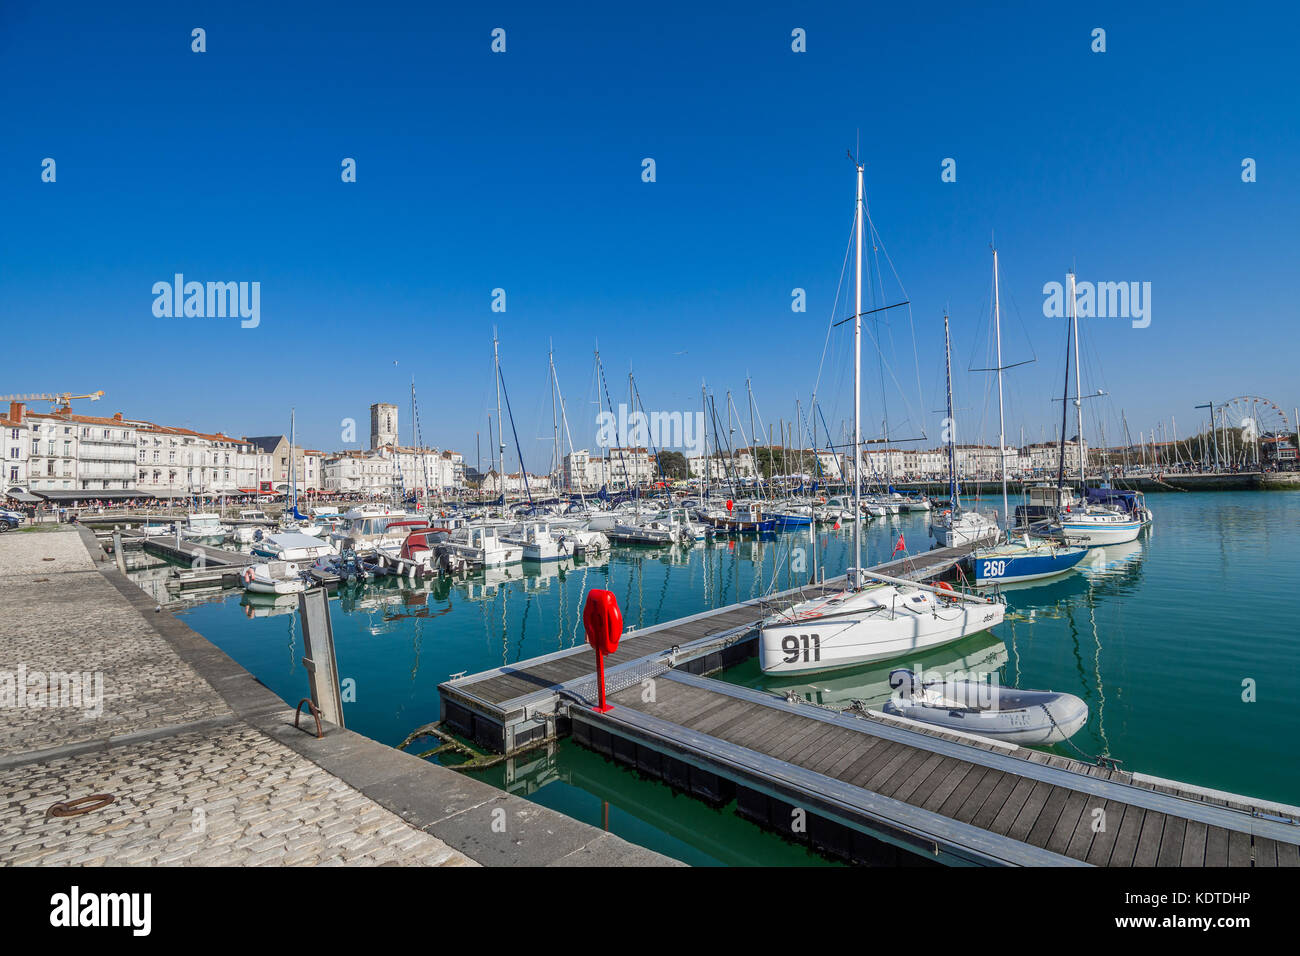 The old port (Vieux Port) of La Rochelle, Charente-Maritime, France. - Stock Image